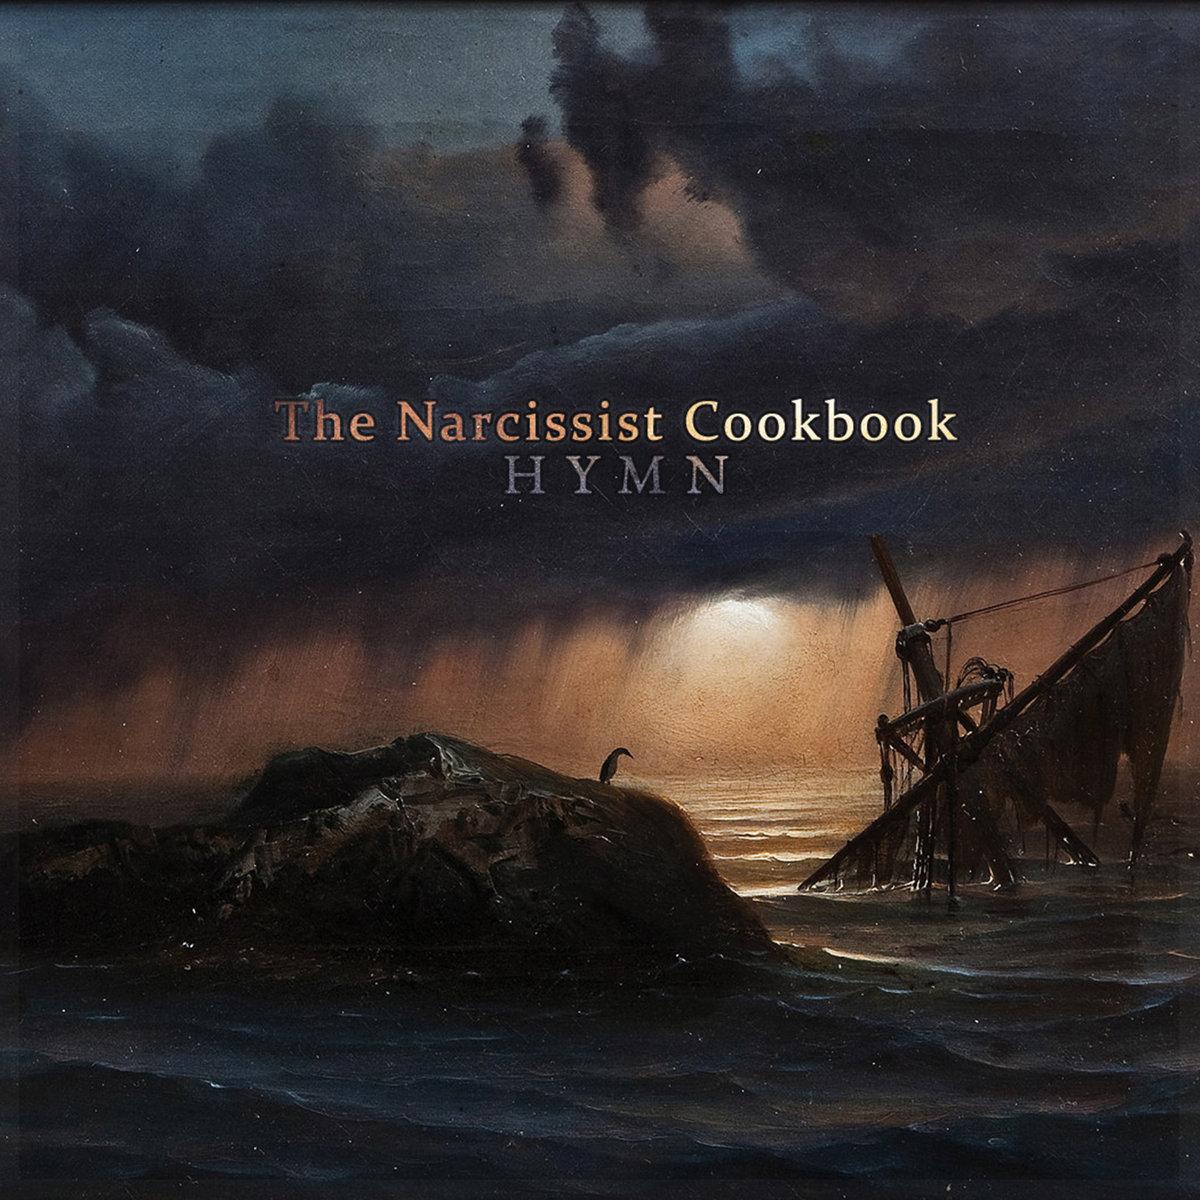 "<img src=""NarcissistCookbook.jpg"" alt=""The Narcissist Cookbook Scottish Musician Hymn album cover"" />"